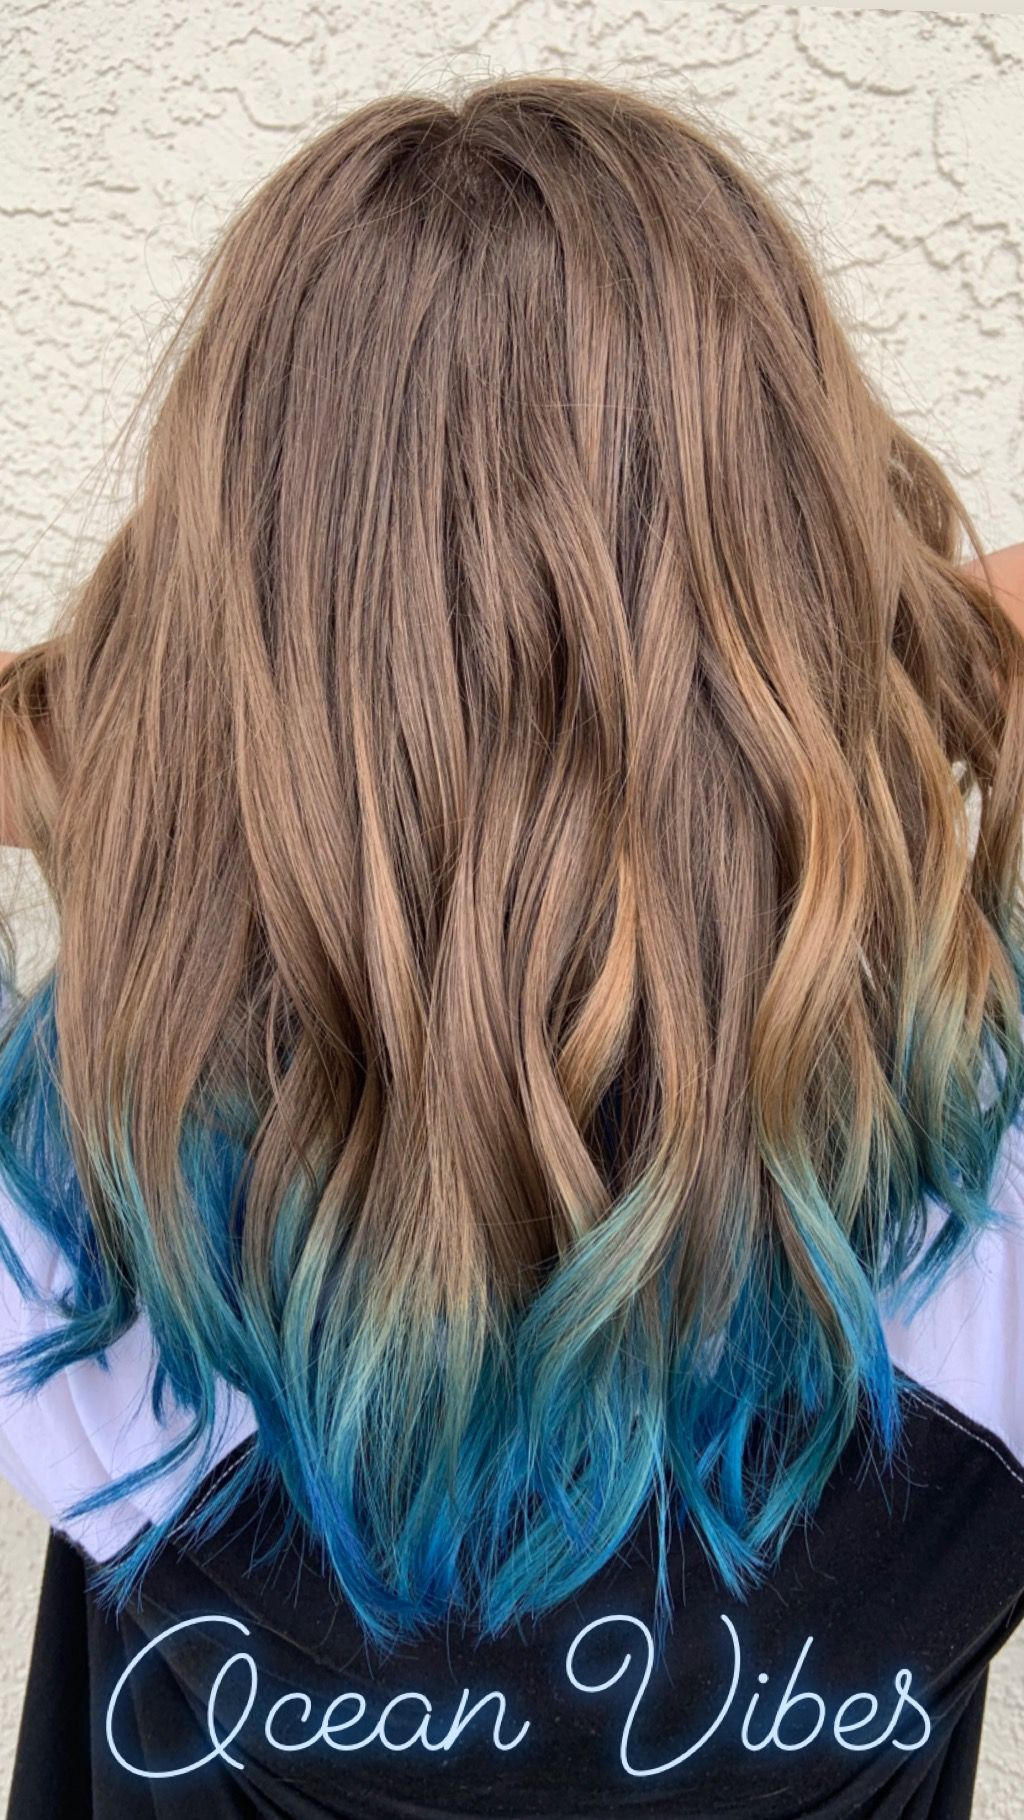 Blue Dip Dyed Hair Dip Dye Hair Blonde Blonde And Blue Hair Blonde Hair Tips